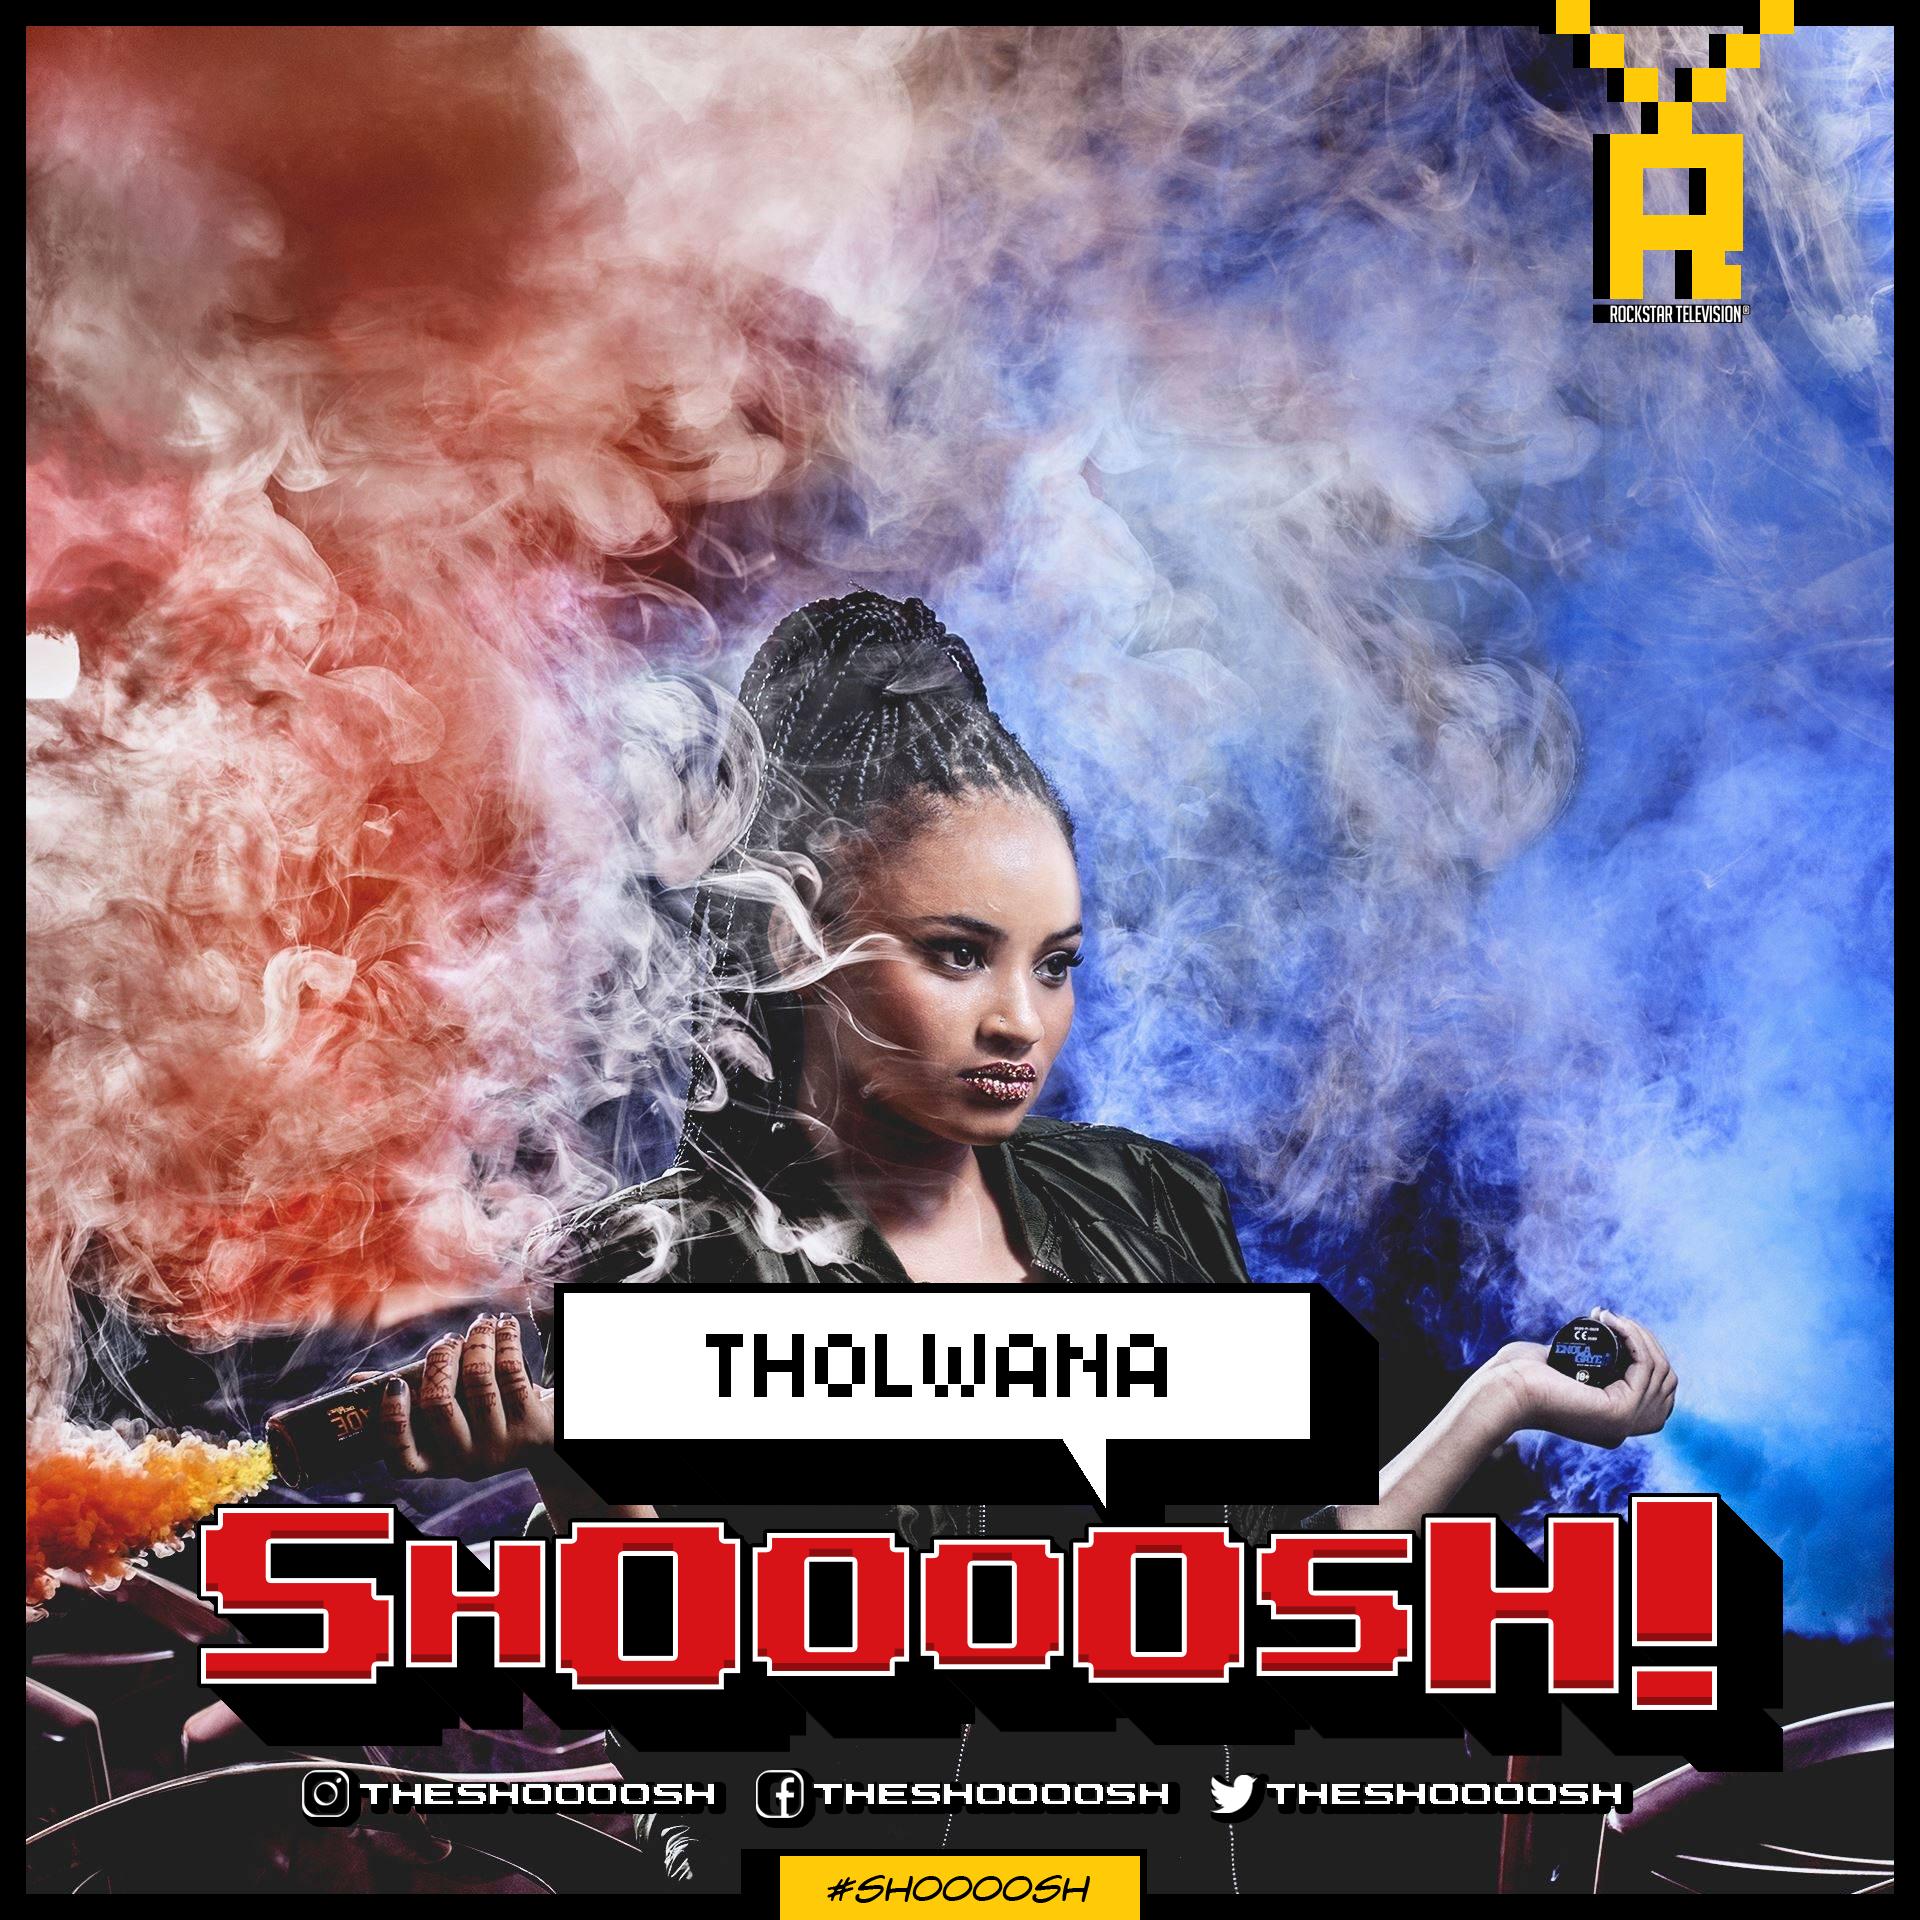 SHOOOOSH! THOLWANA00001